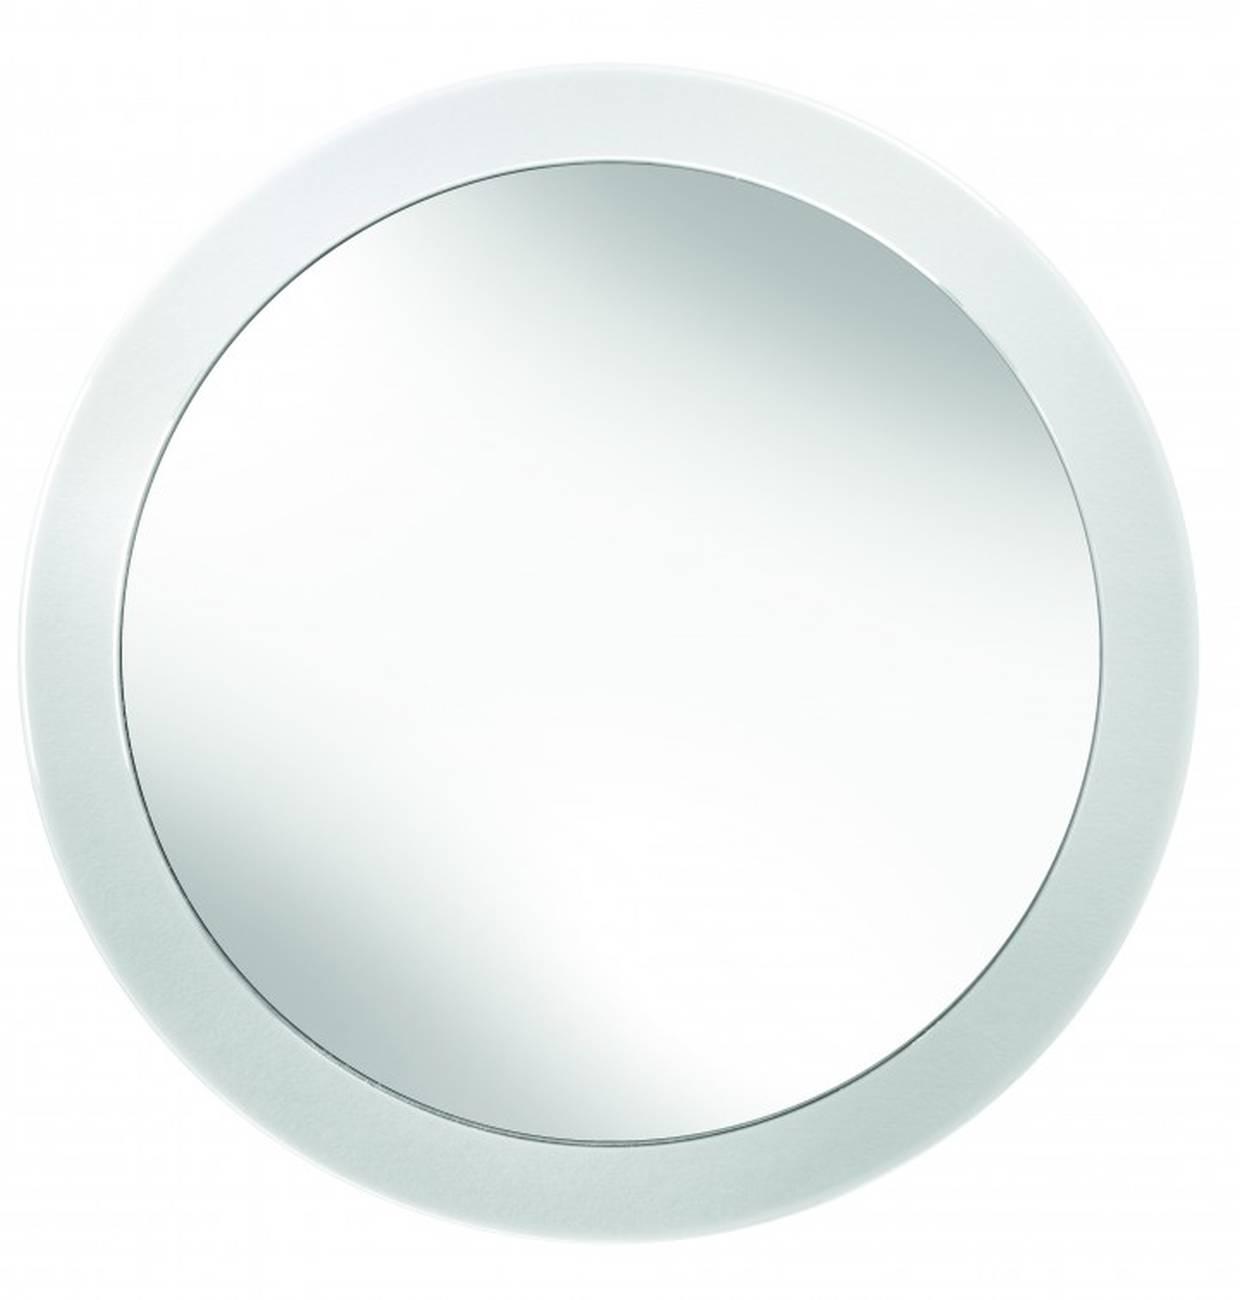 Kosmetikspiegel Easy Mirror Polystyrol/Glas Schwarz Spiegel